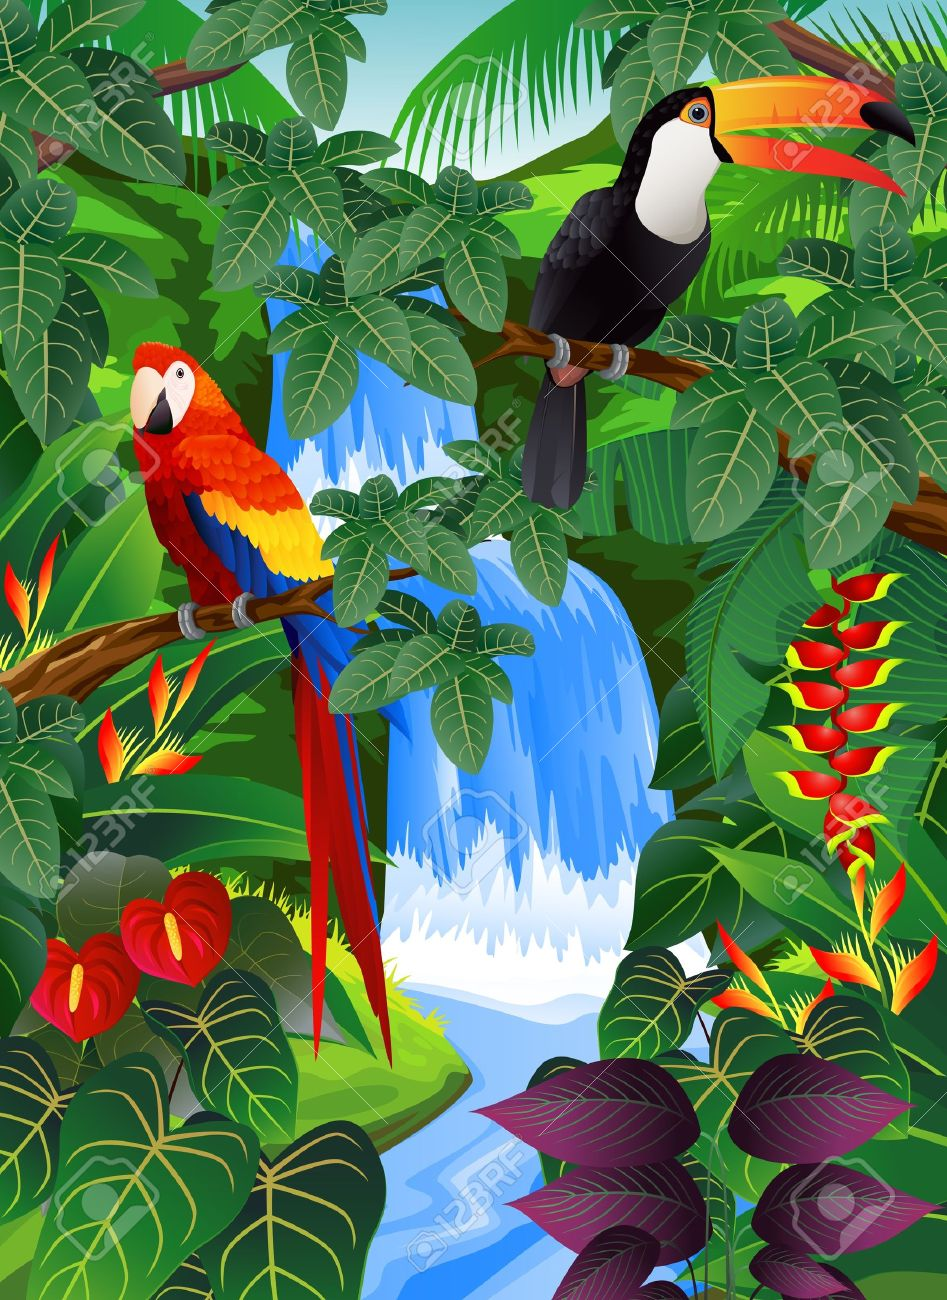 Amazonas river clipart #15